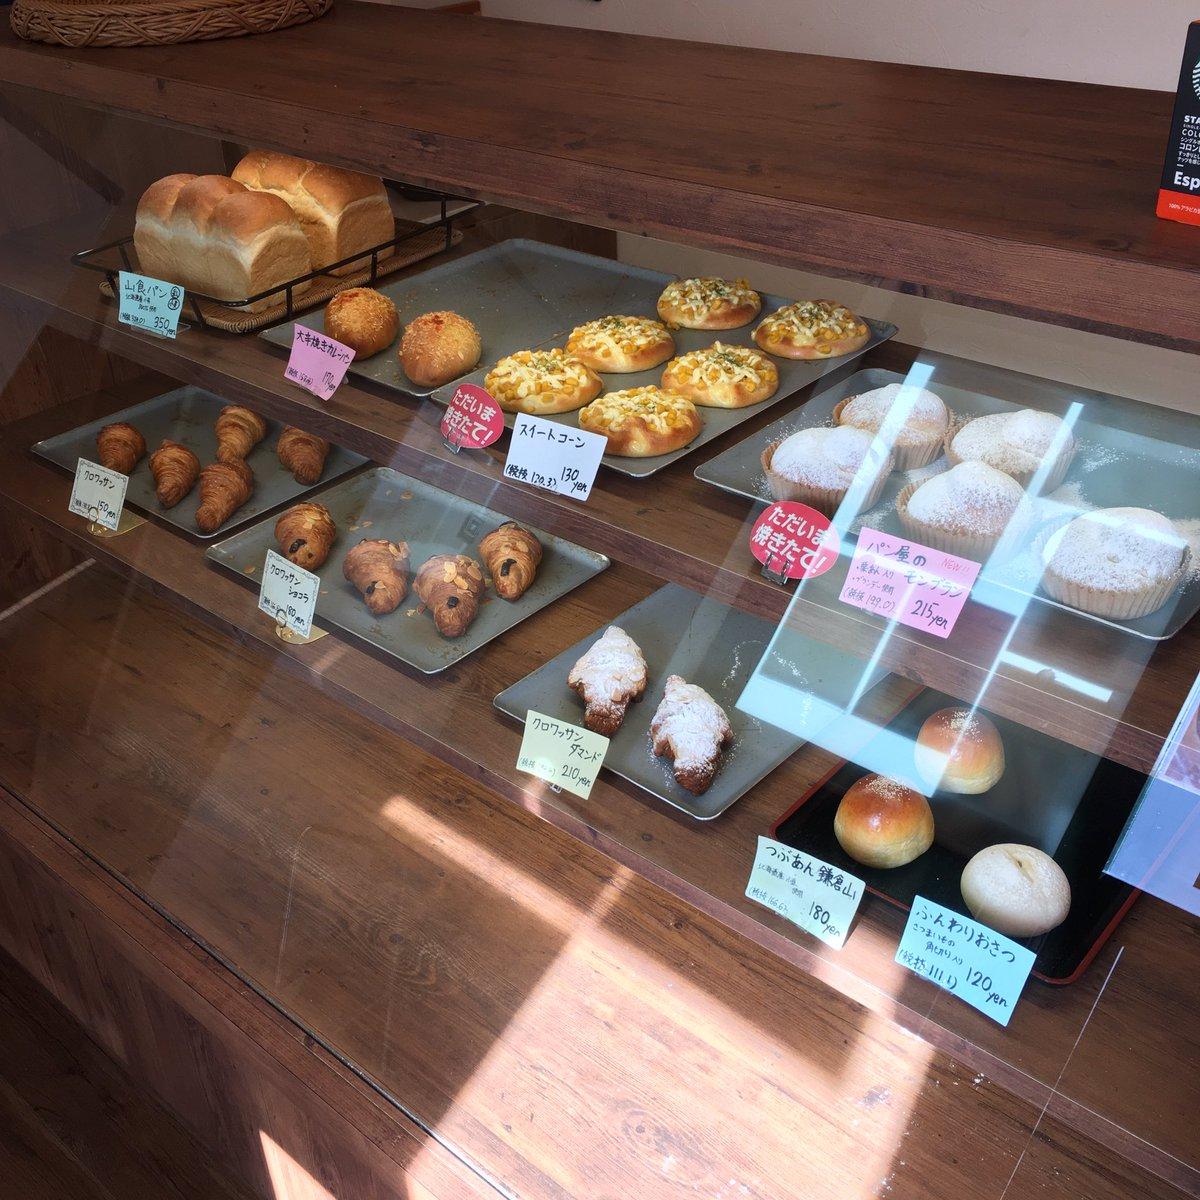 test ツイッターメディア - スイートコーンとパン屋のモンブランが焼きあがりました(°▽°)  山食パンはスライスできます! https://t.co/yKVB0ZnDyy